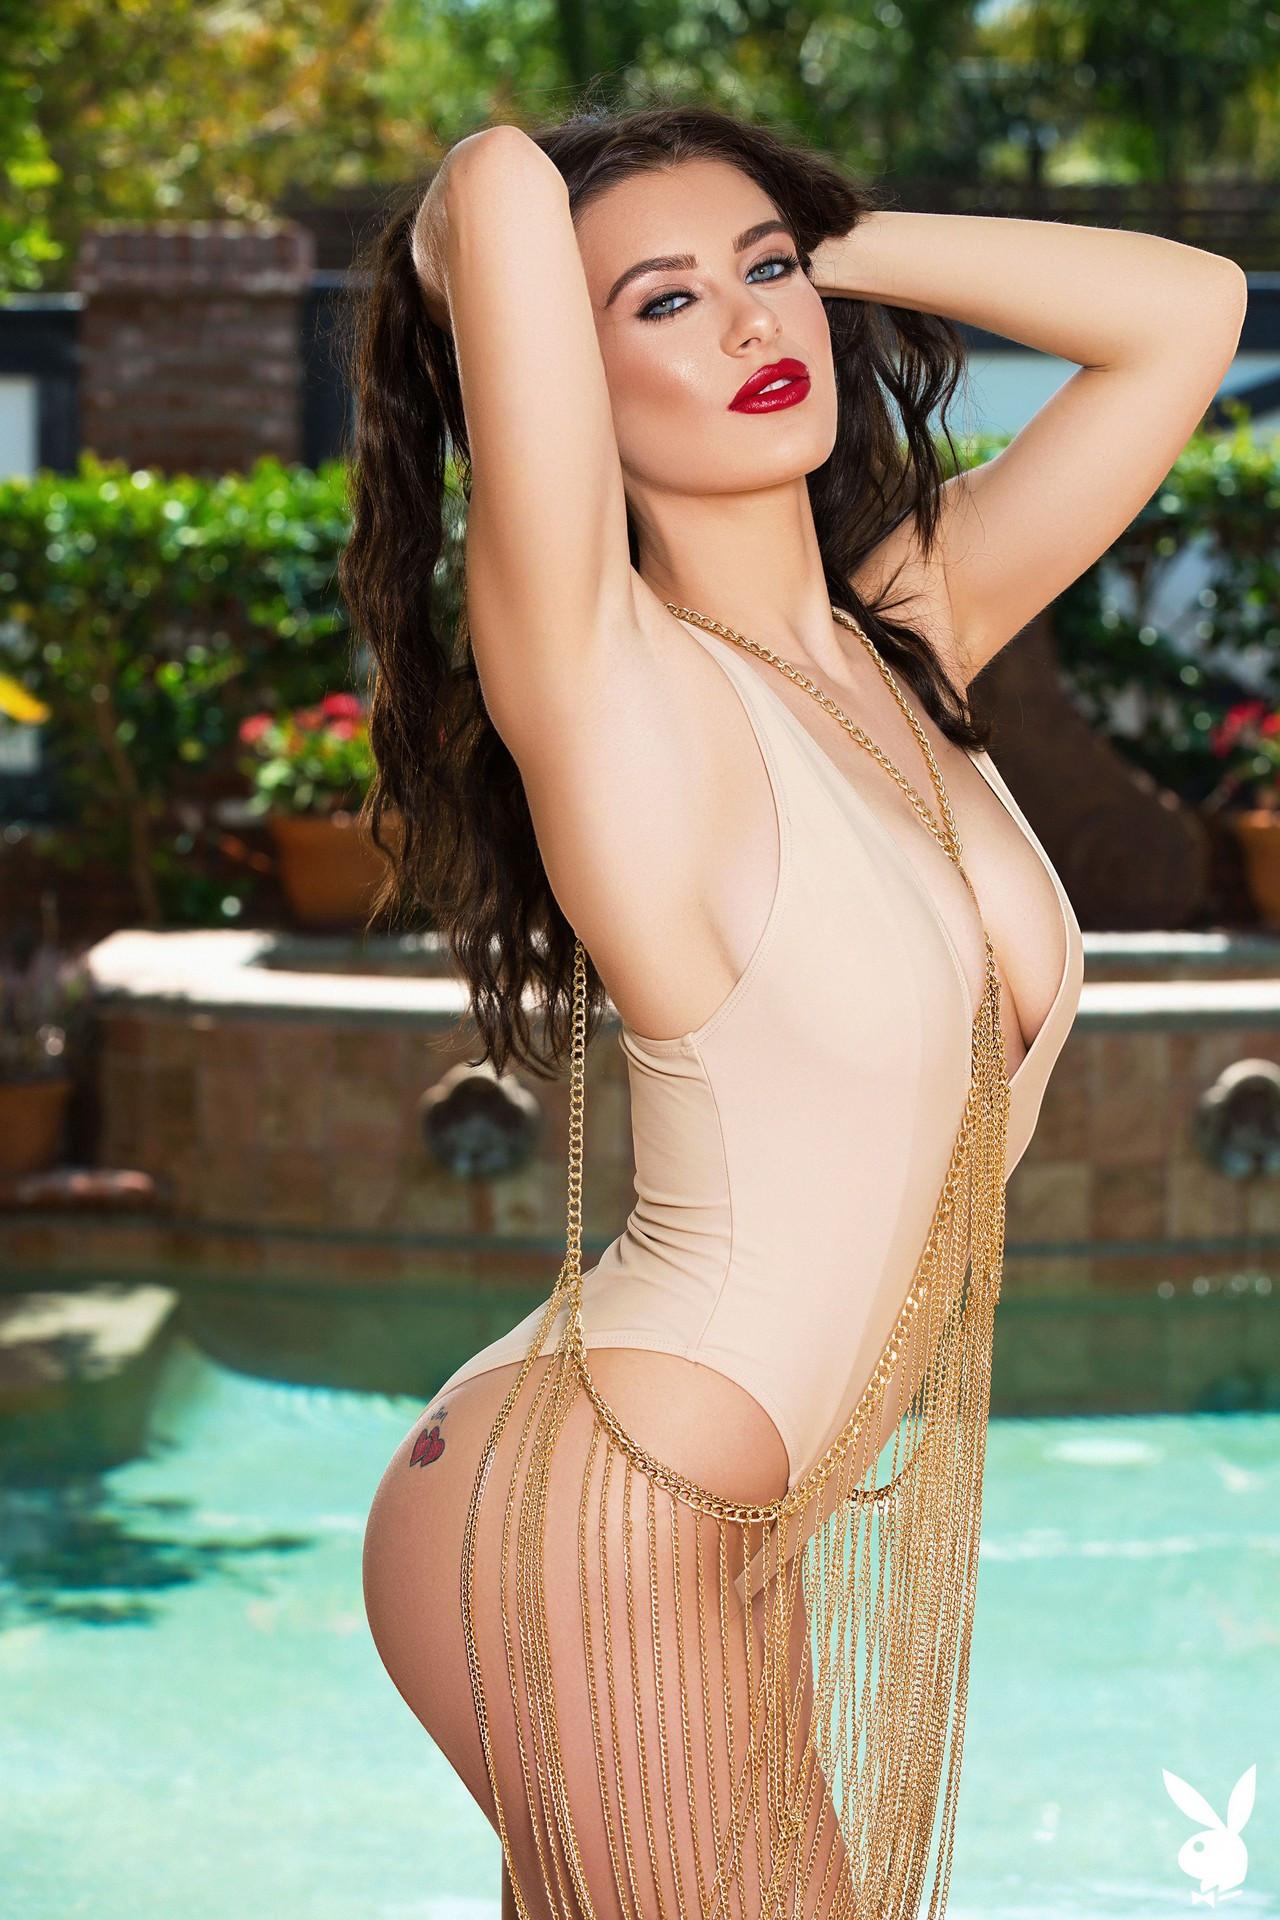 Lana Rhoades Live @ 5 Playboy Plus (11)